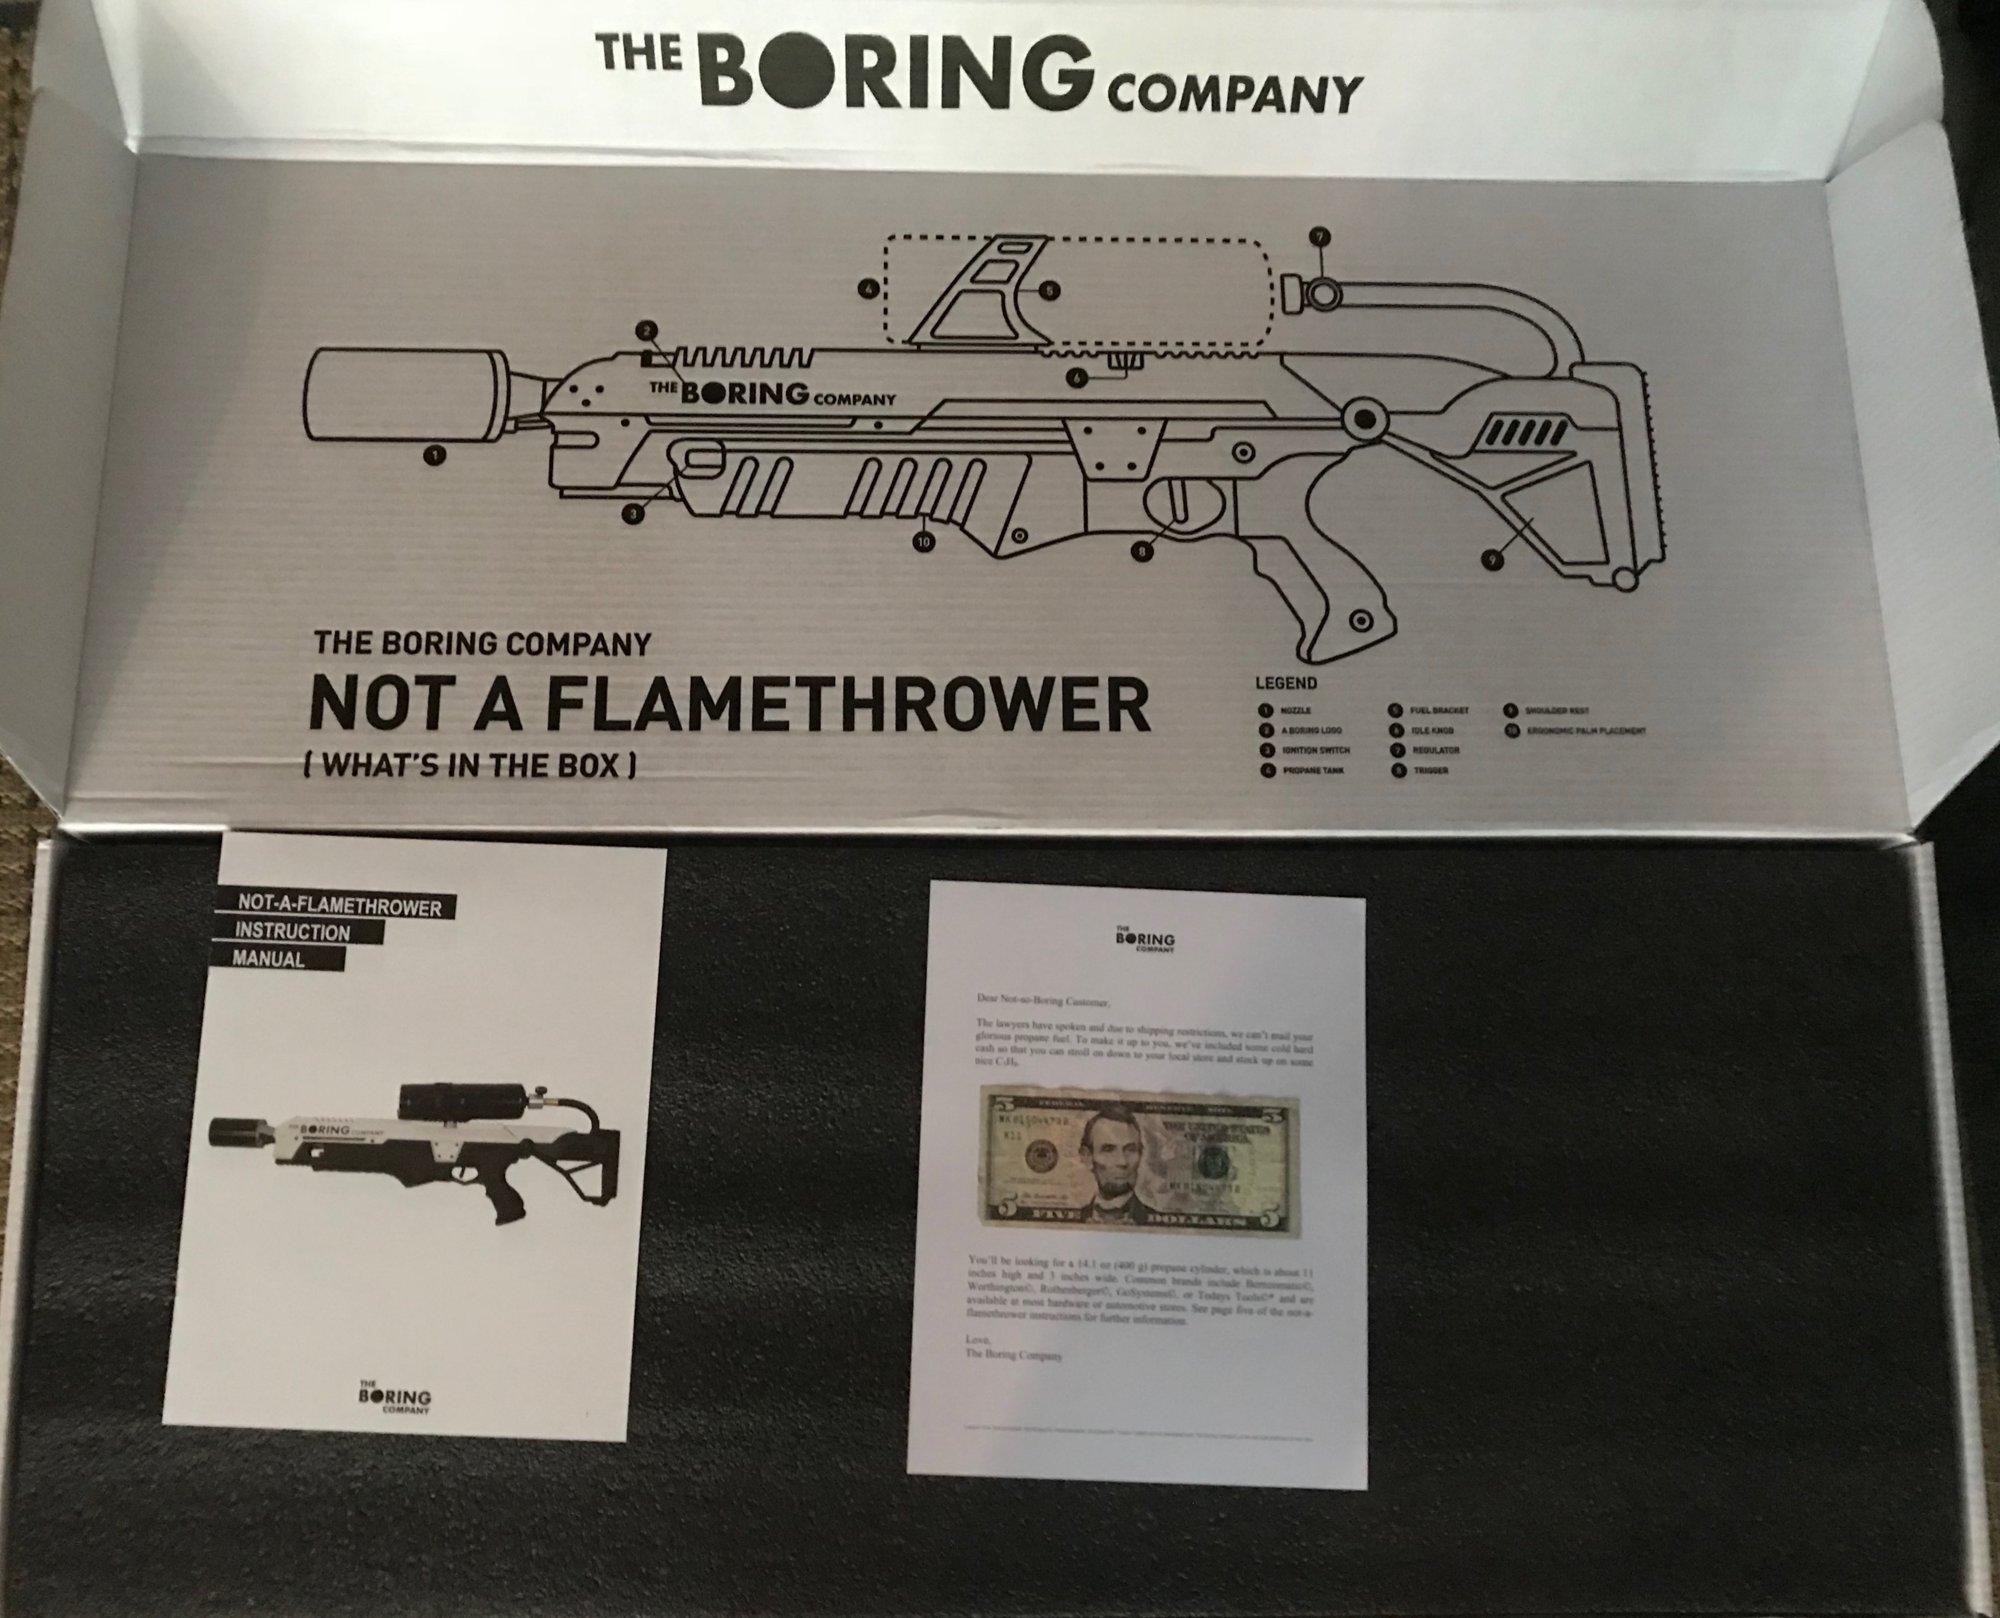 BoringCoNotAFlamethrower - 2.jpg